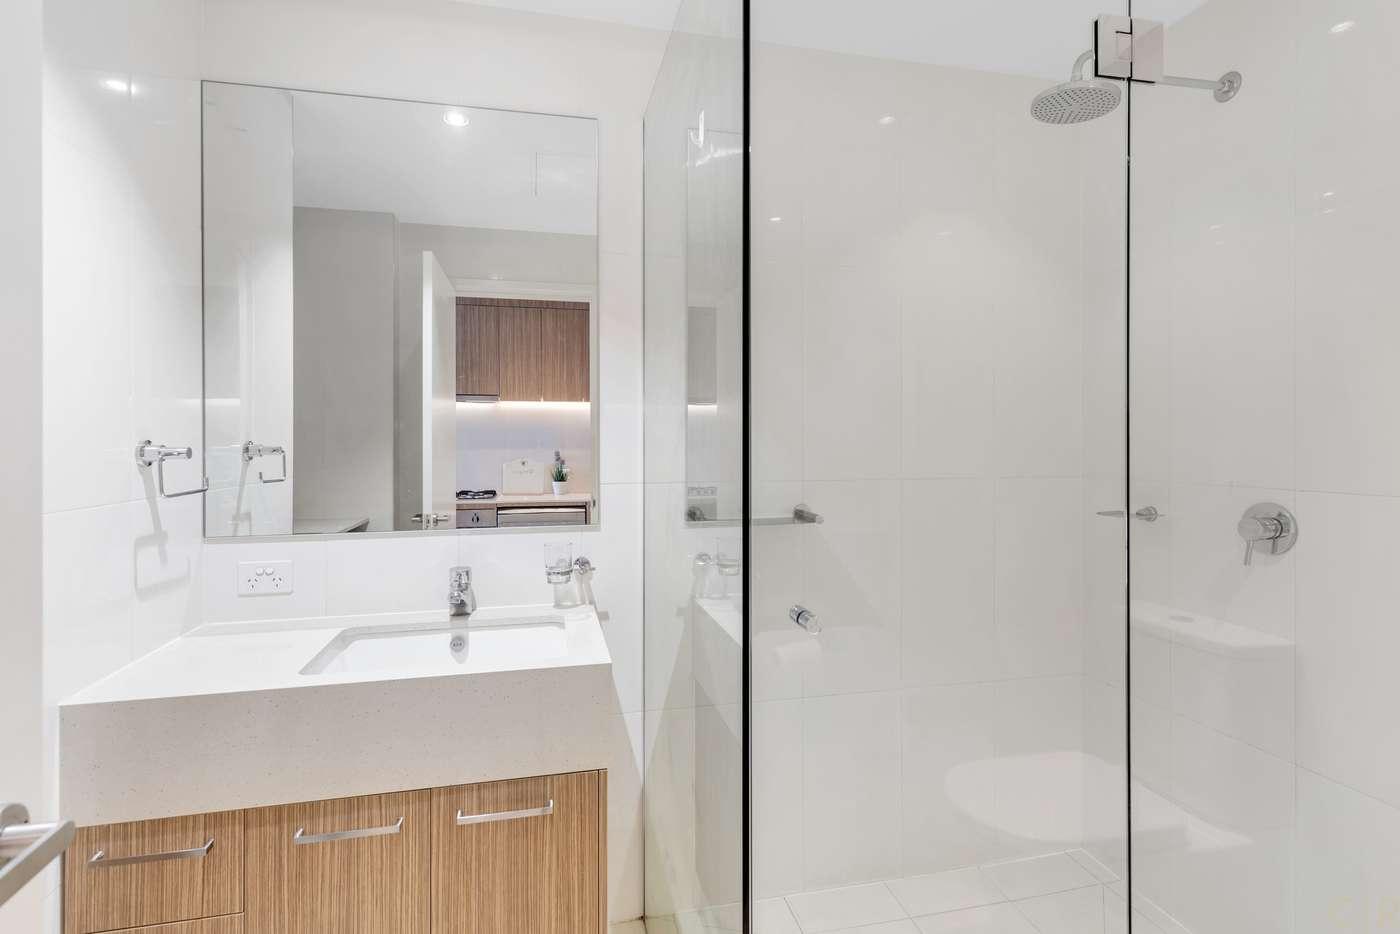 Sixth view of Homely studio listing, 407/180 Morphett Street, Adelaide SA 5000